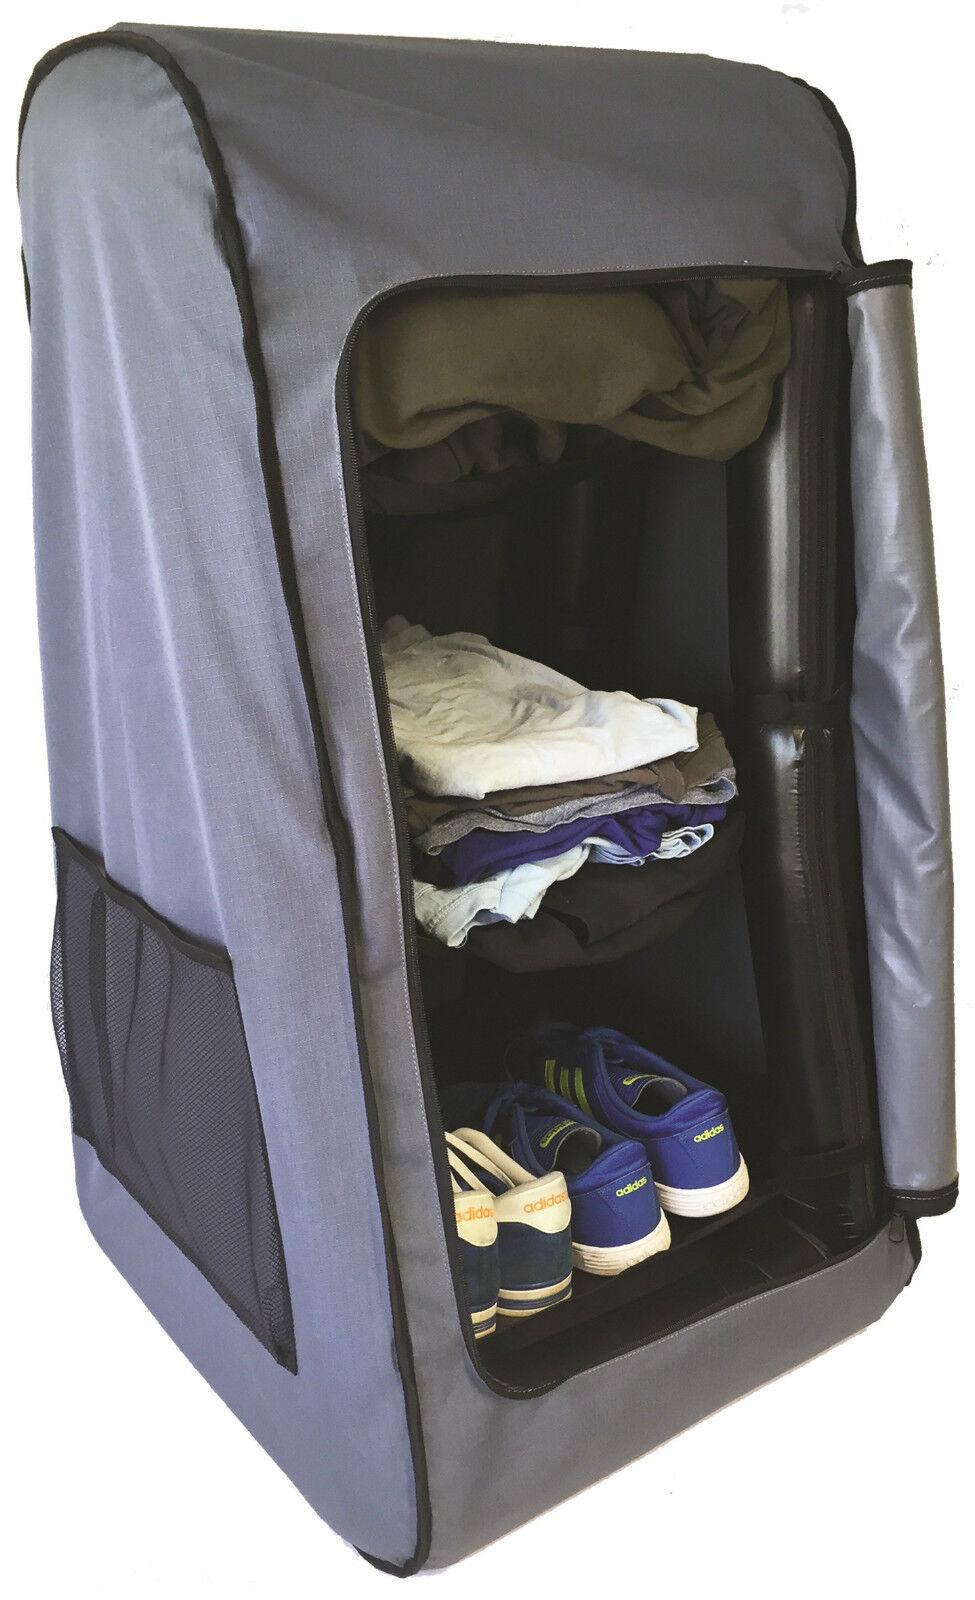 AirDrobe Portable Air Travel Camping Caravan Tent Inflatable Air Portable Clothes Wardrobe 795d38